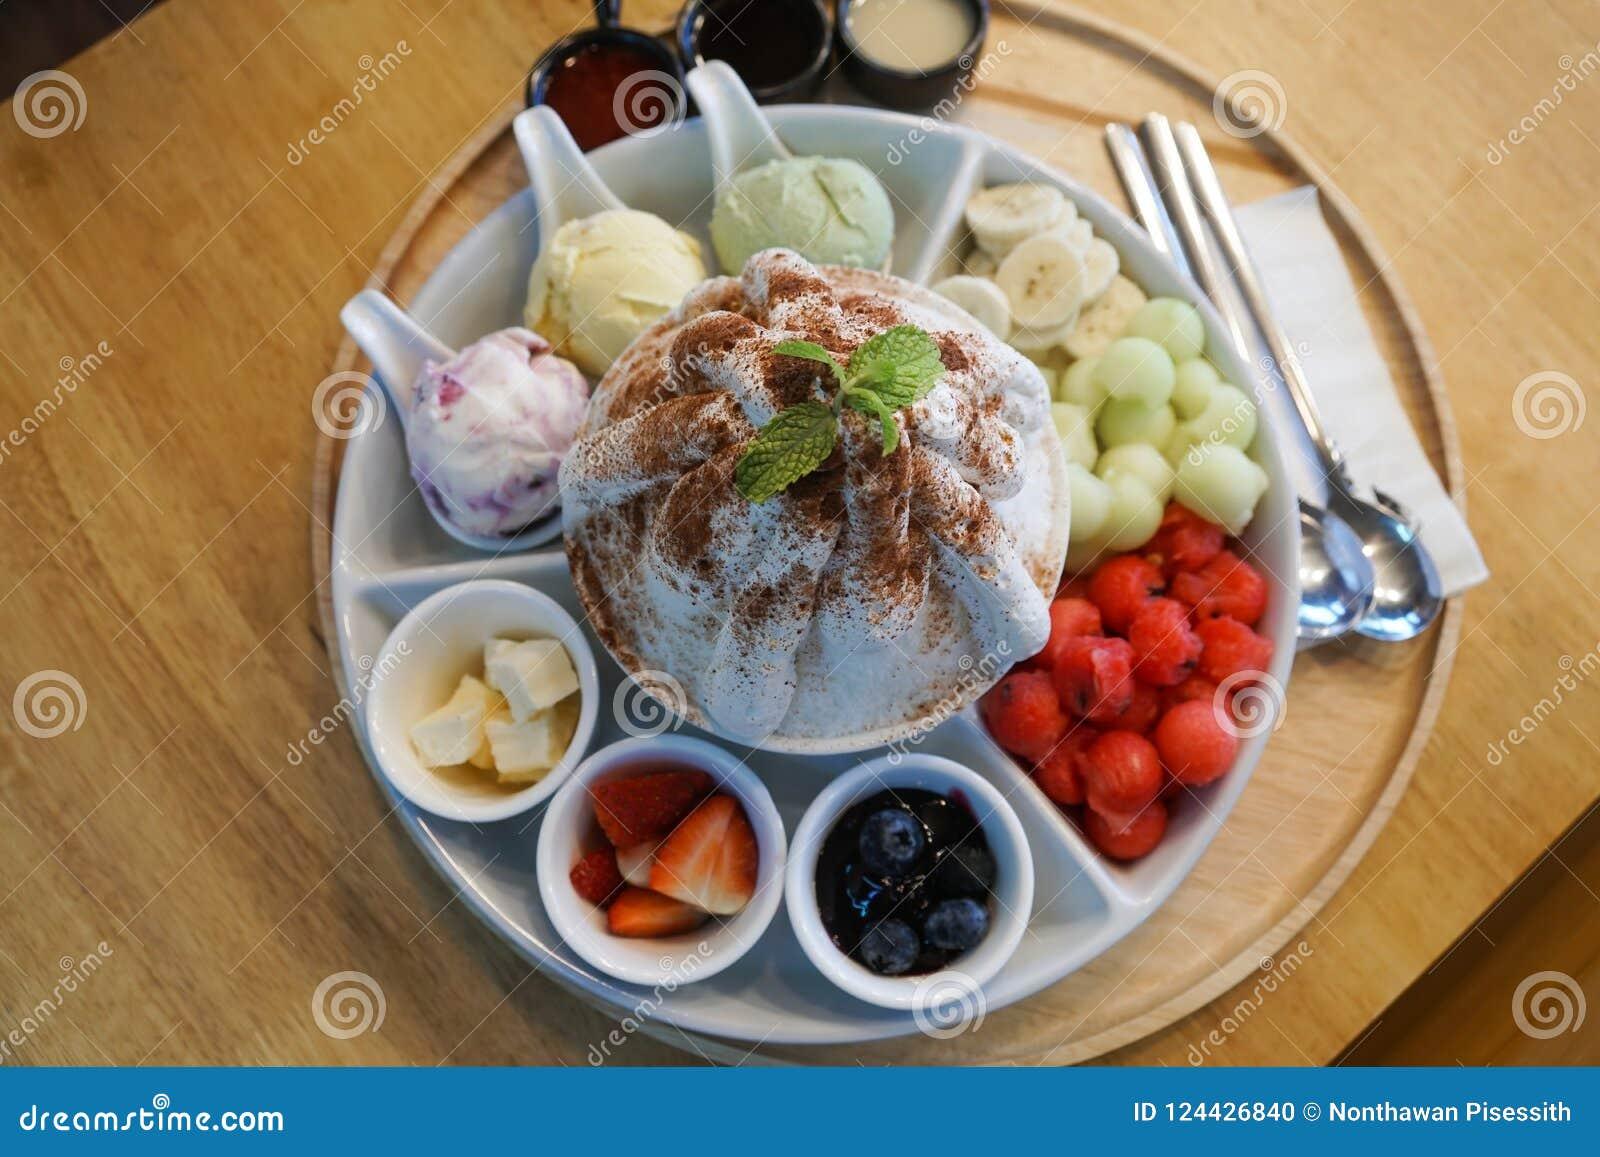 Sweet bingsu korean desert with fruits, melon, strawberries, blueberries, watermelon, icecream